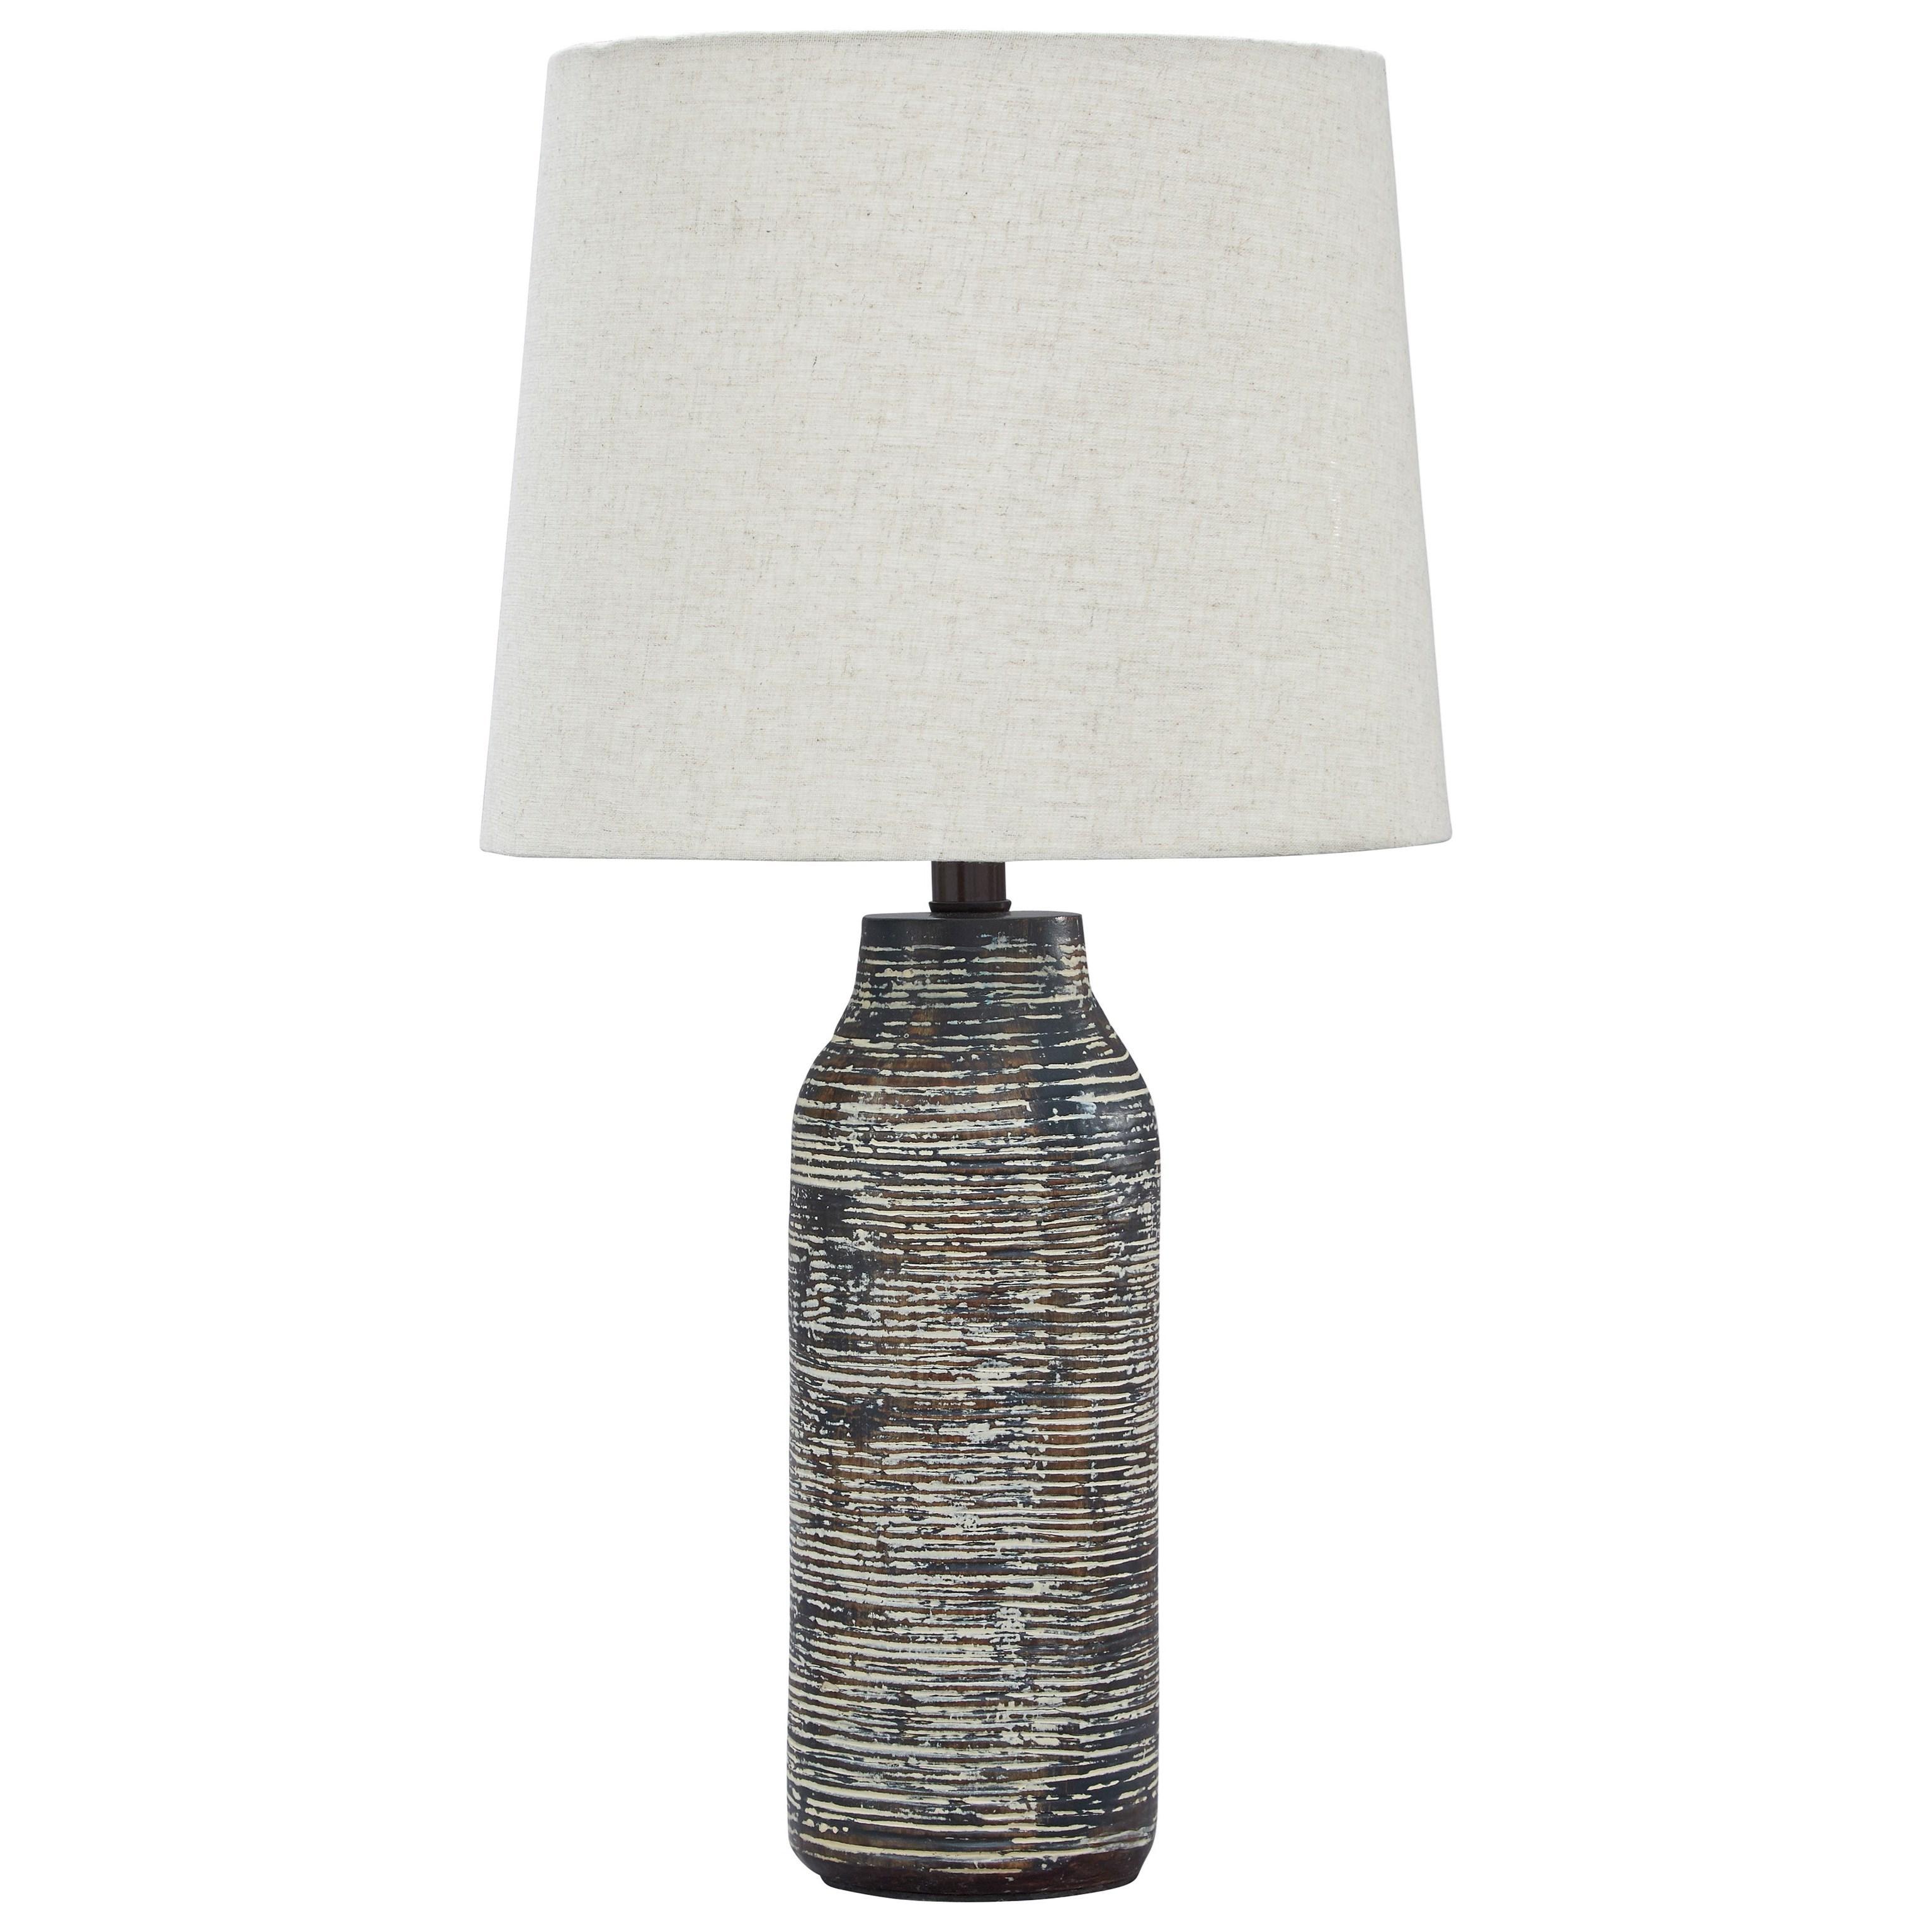 Set of 2 Mahima Black/White Table Lamps